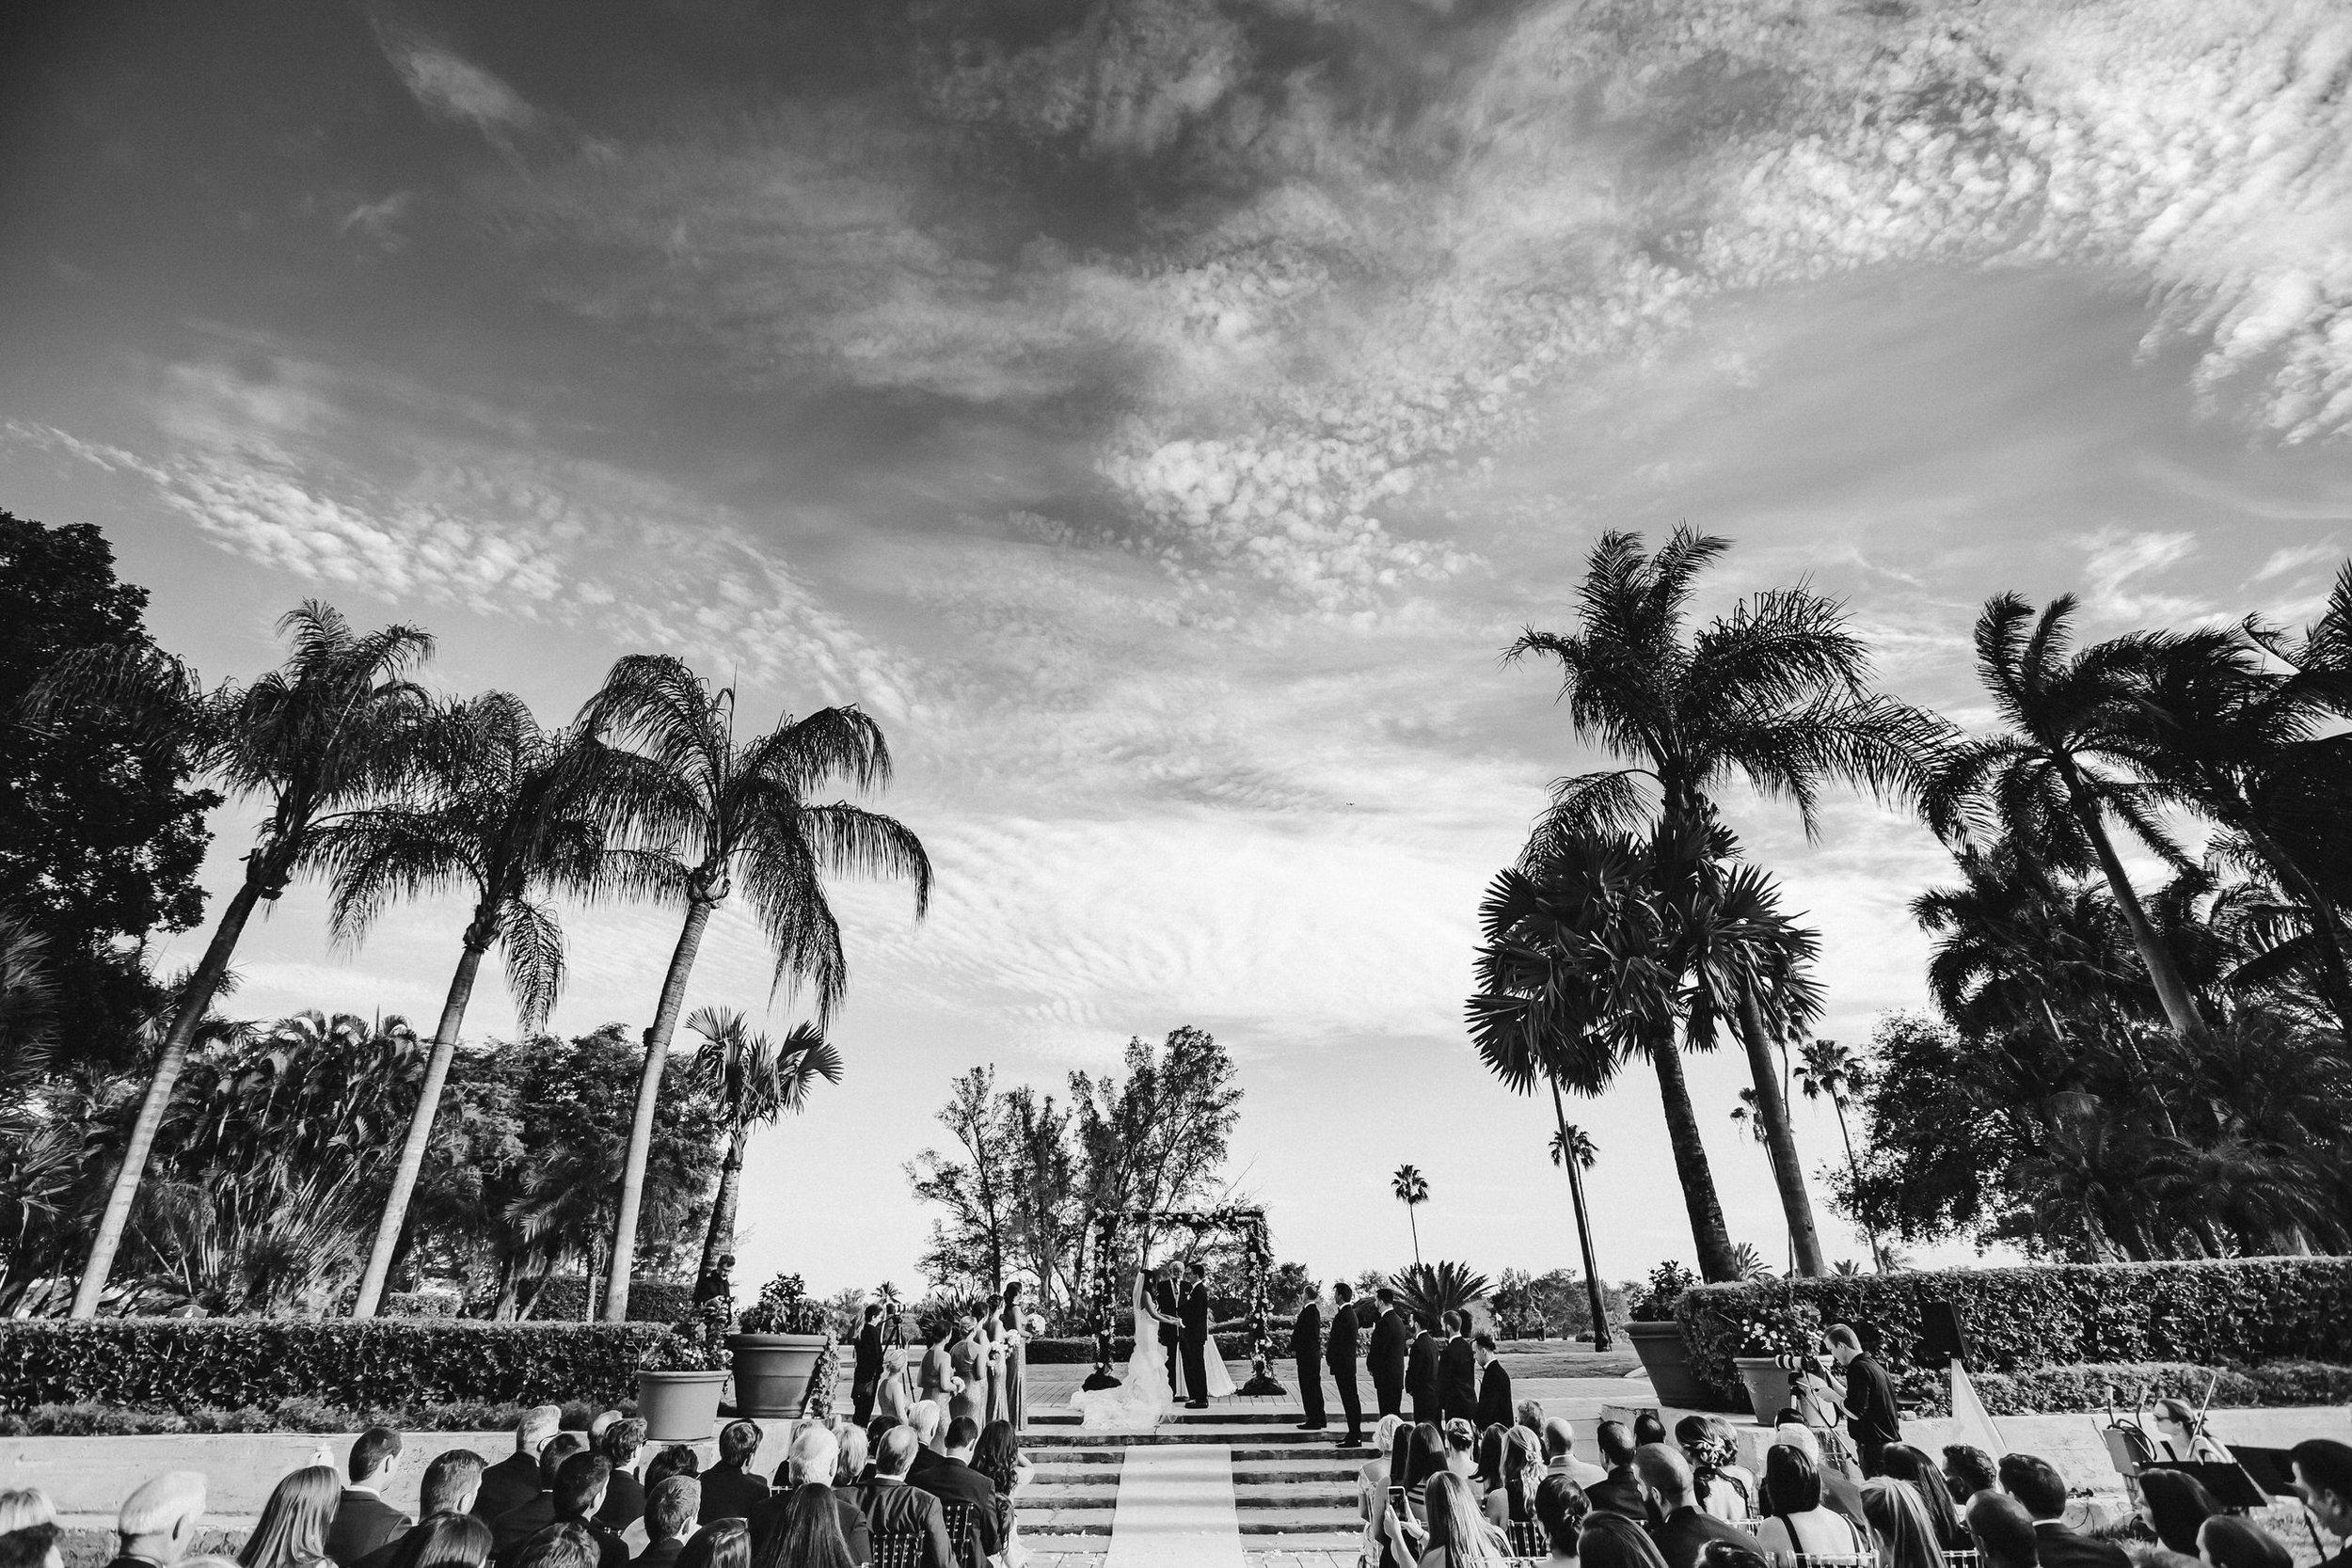 miami-biltmore-wedding-photographer-ceremony-steph-lynn-photo-20.jpg